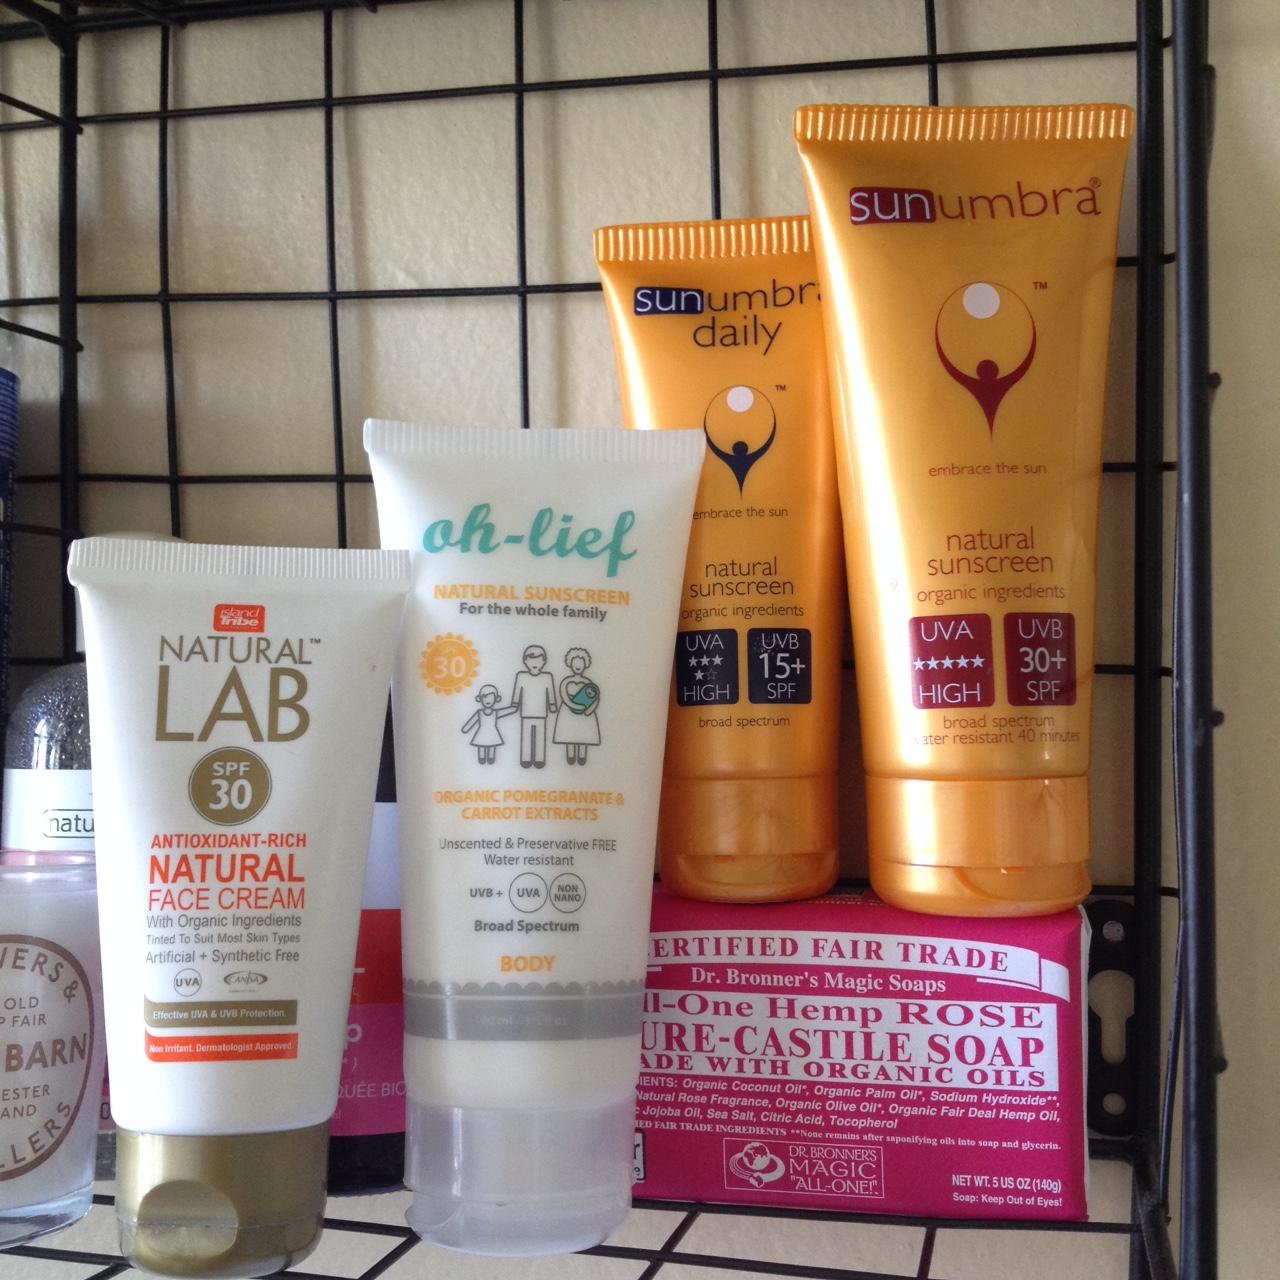 facial All sunscreen natural